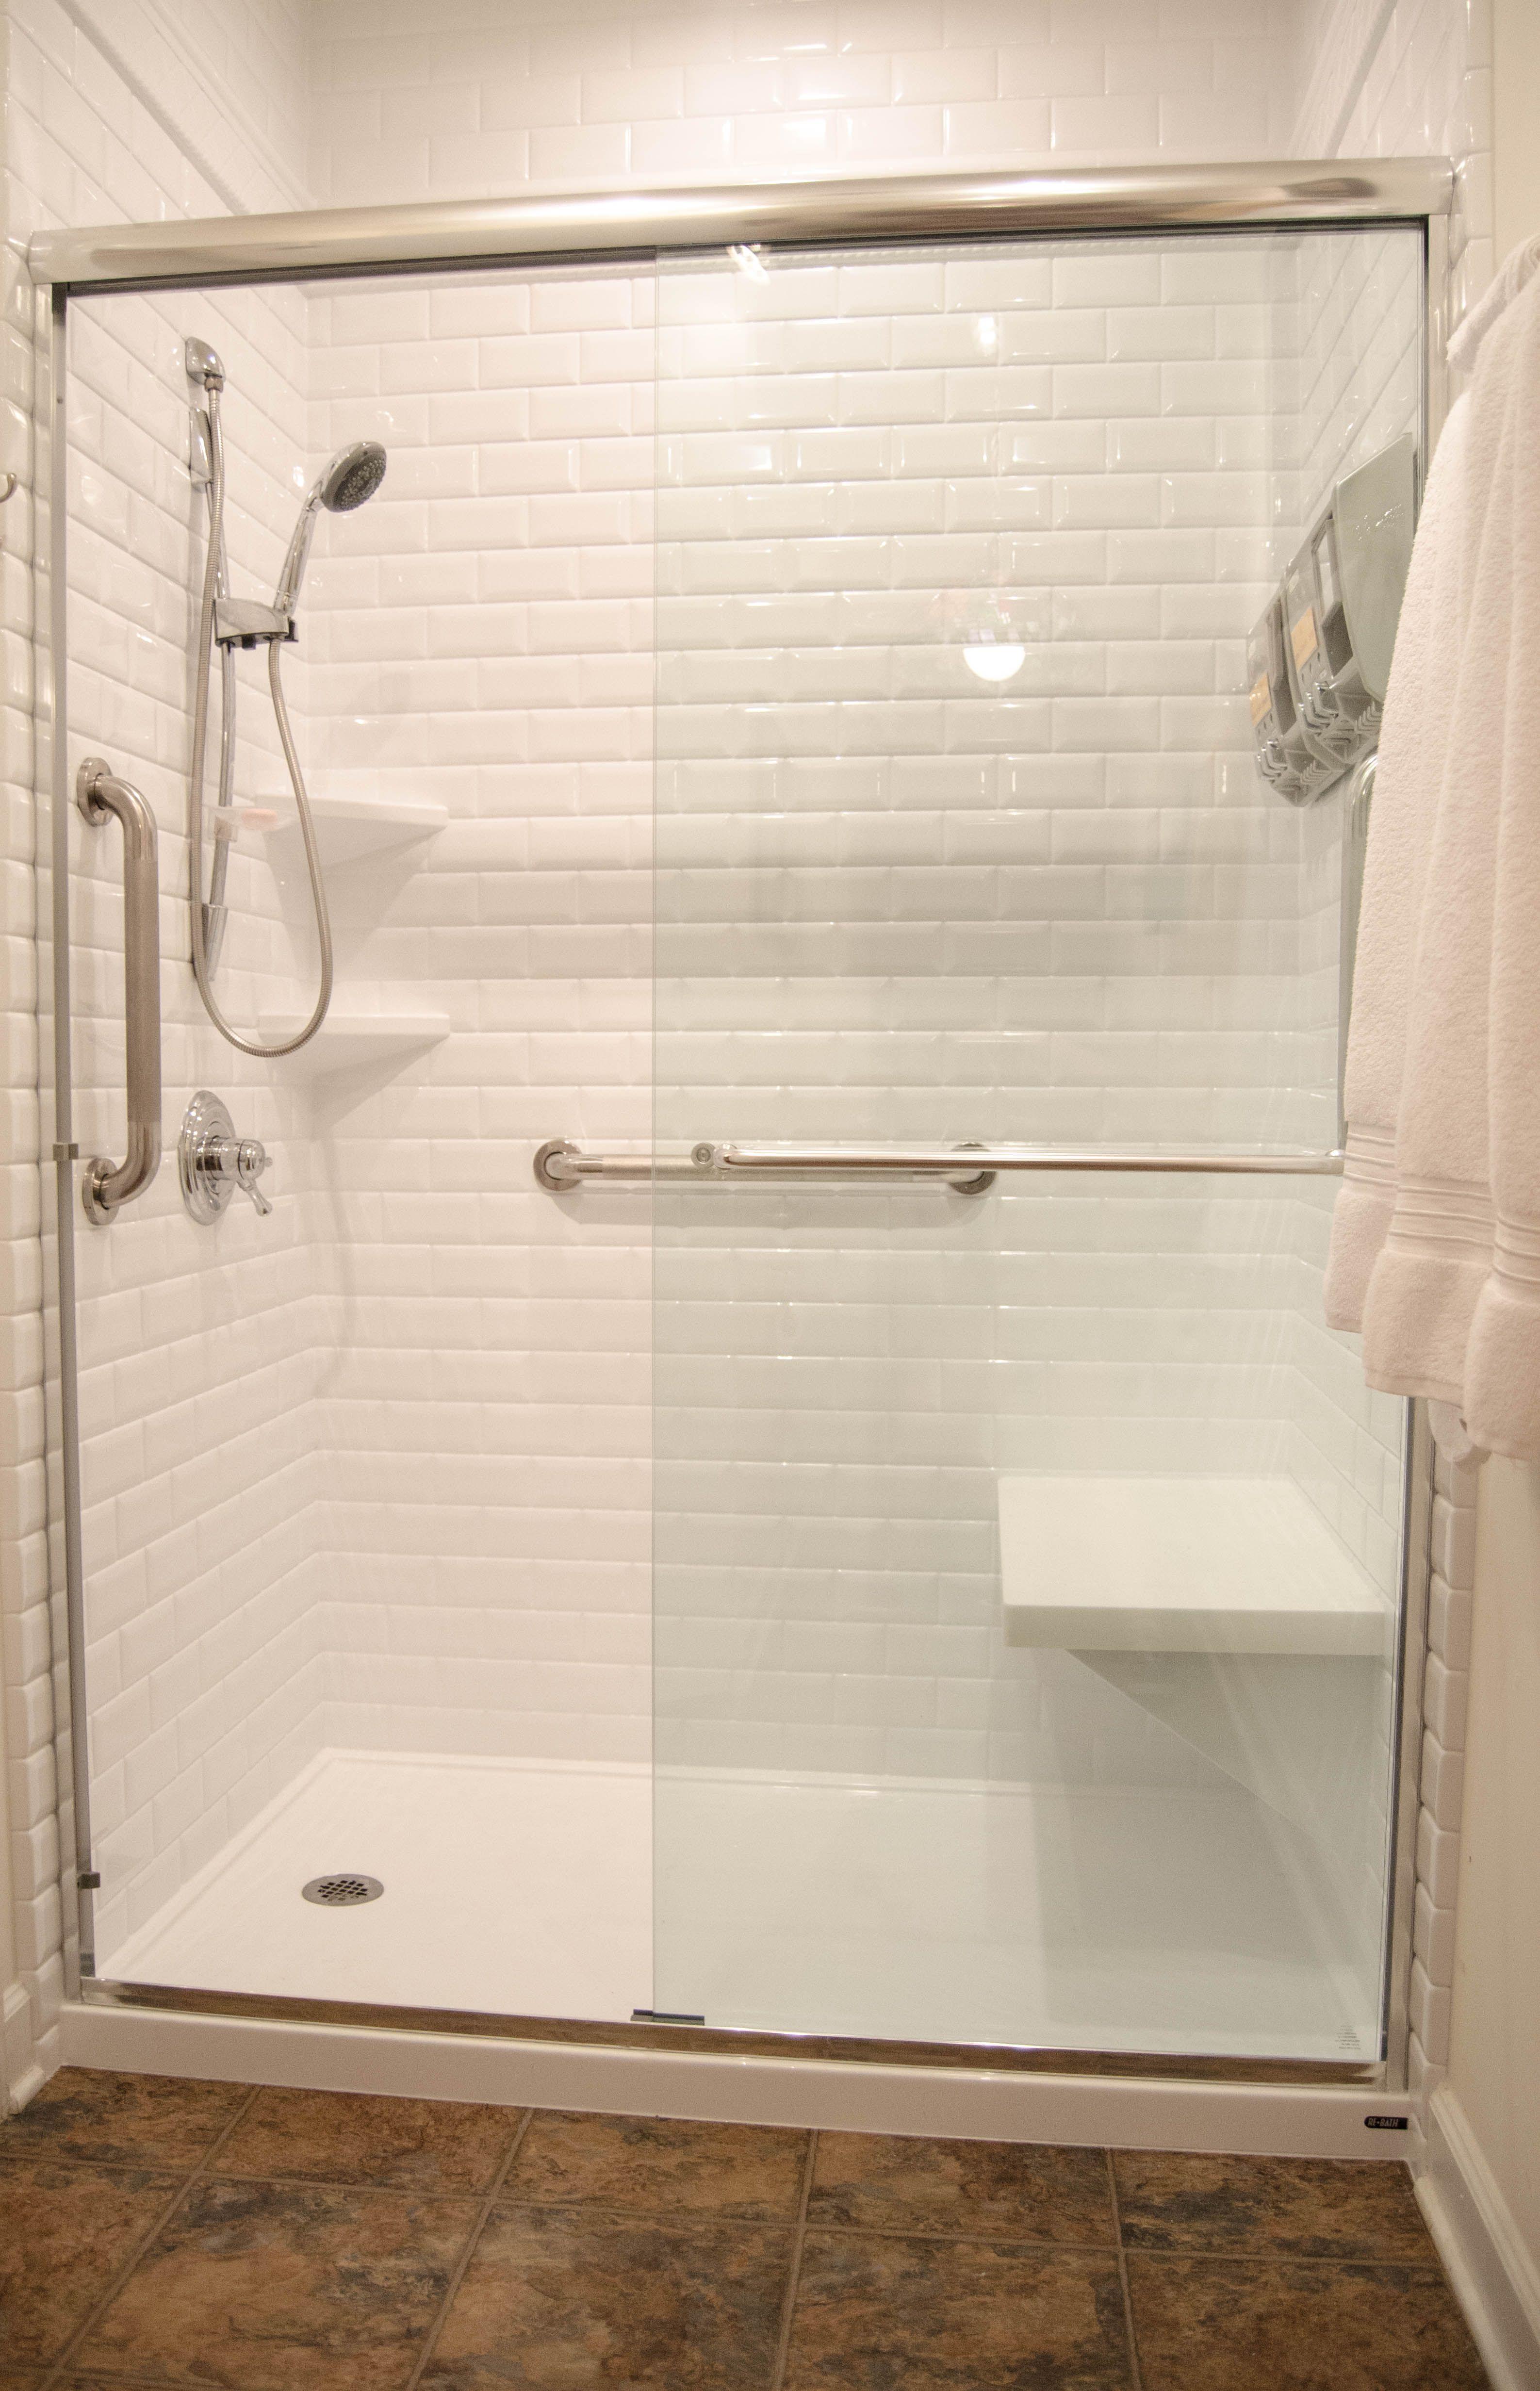 Updated Bathroom Remodel Shower Seat Handheld Shower Head Grab Bar Glass Slidin Cheap Bathroom Remodel Simple Bathroom Remodel Inexpensive Bathroom Remodel